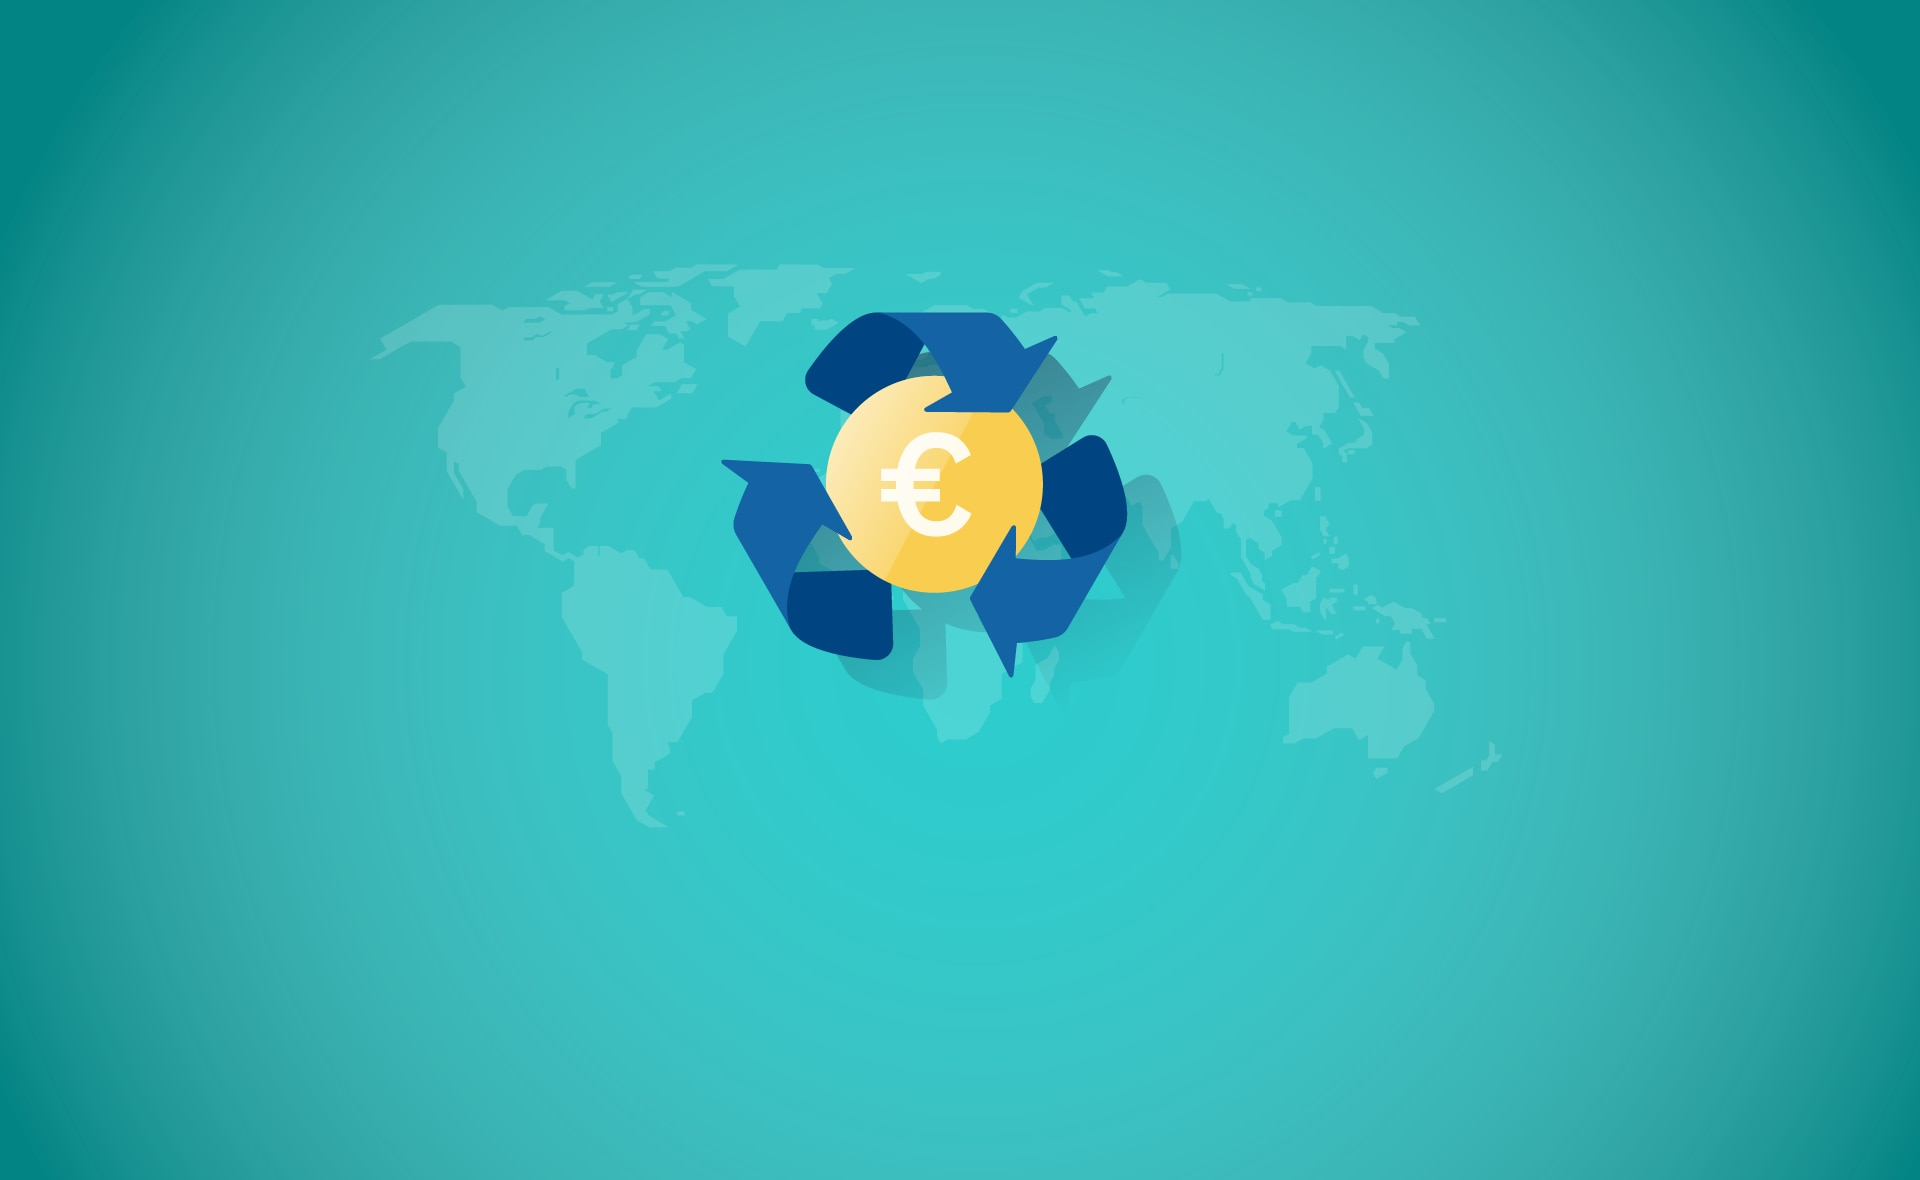 BBVA-economia-circular-planes-circulares-finanzas